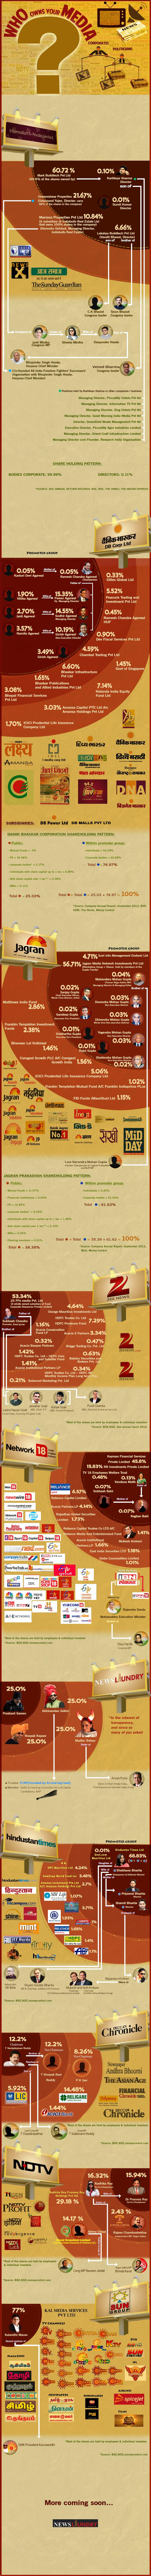 India-News-infographic1